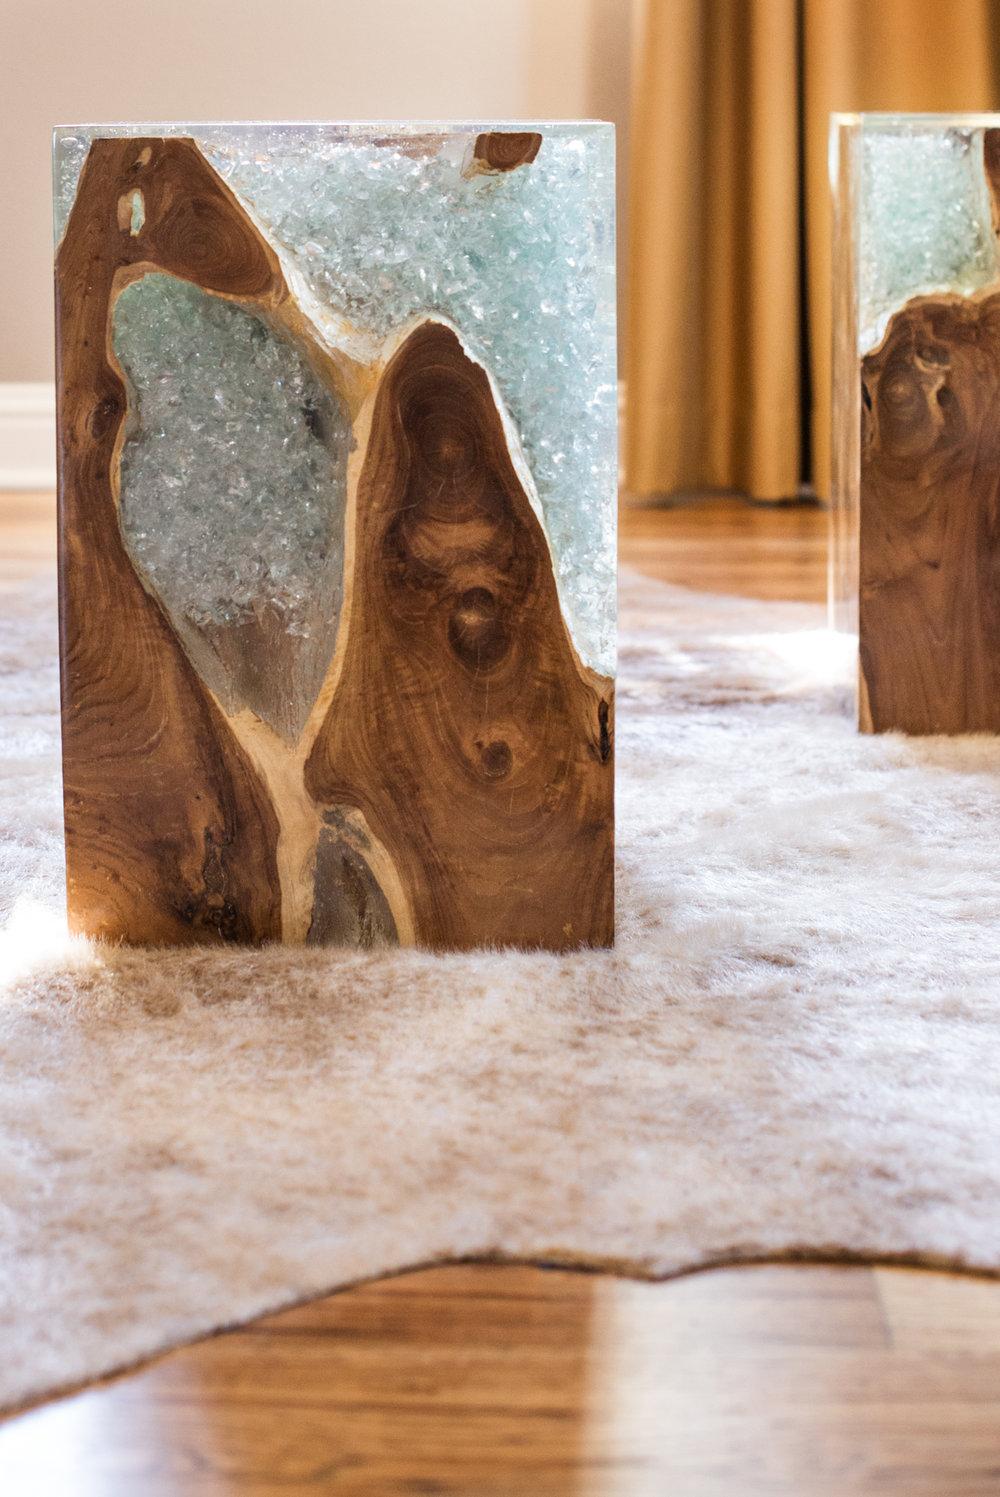 Contemporary Living Room furnishing selections and interior design - Reno, Nevada - Kovac Design